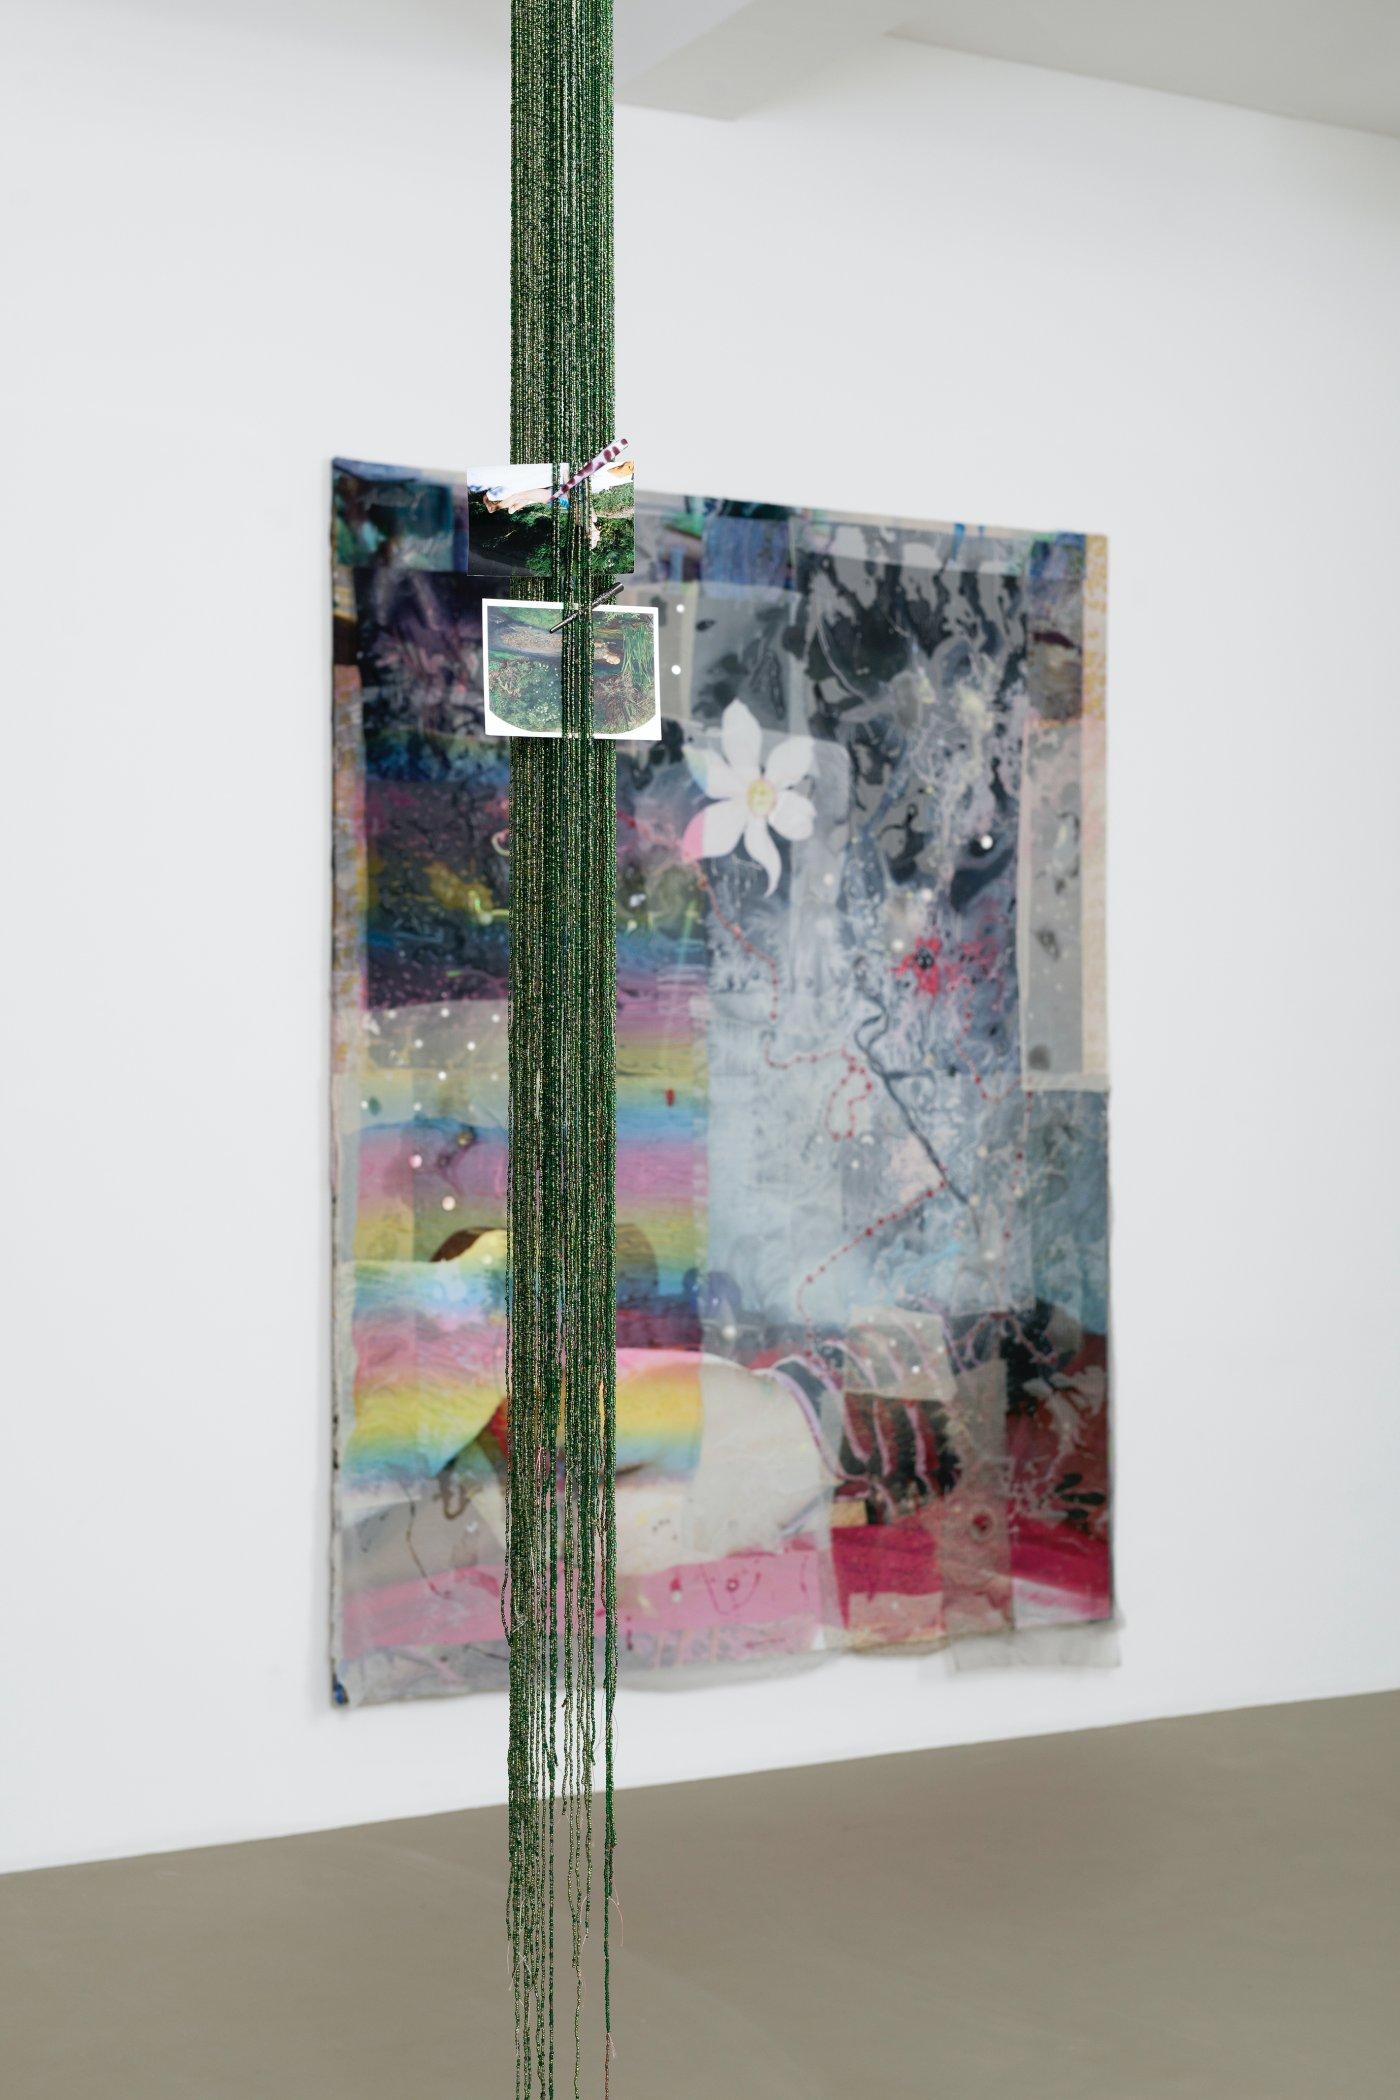 Galerie Chantal Crousel Mimosa Echard 2